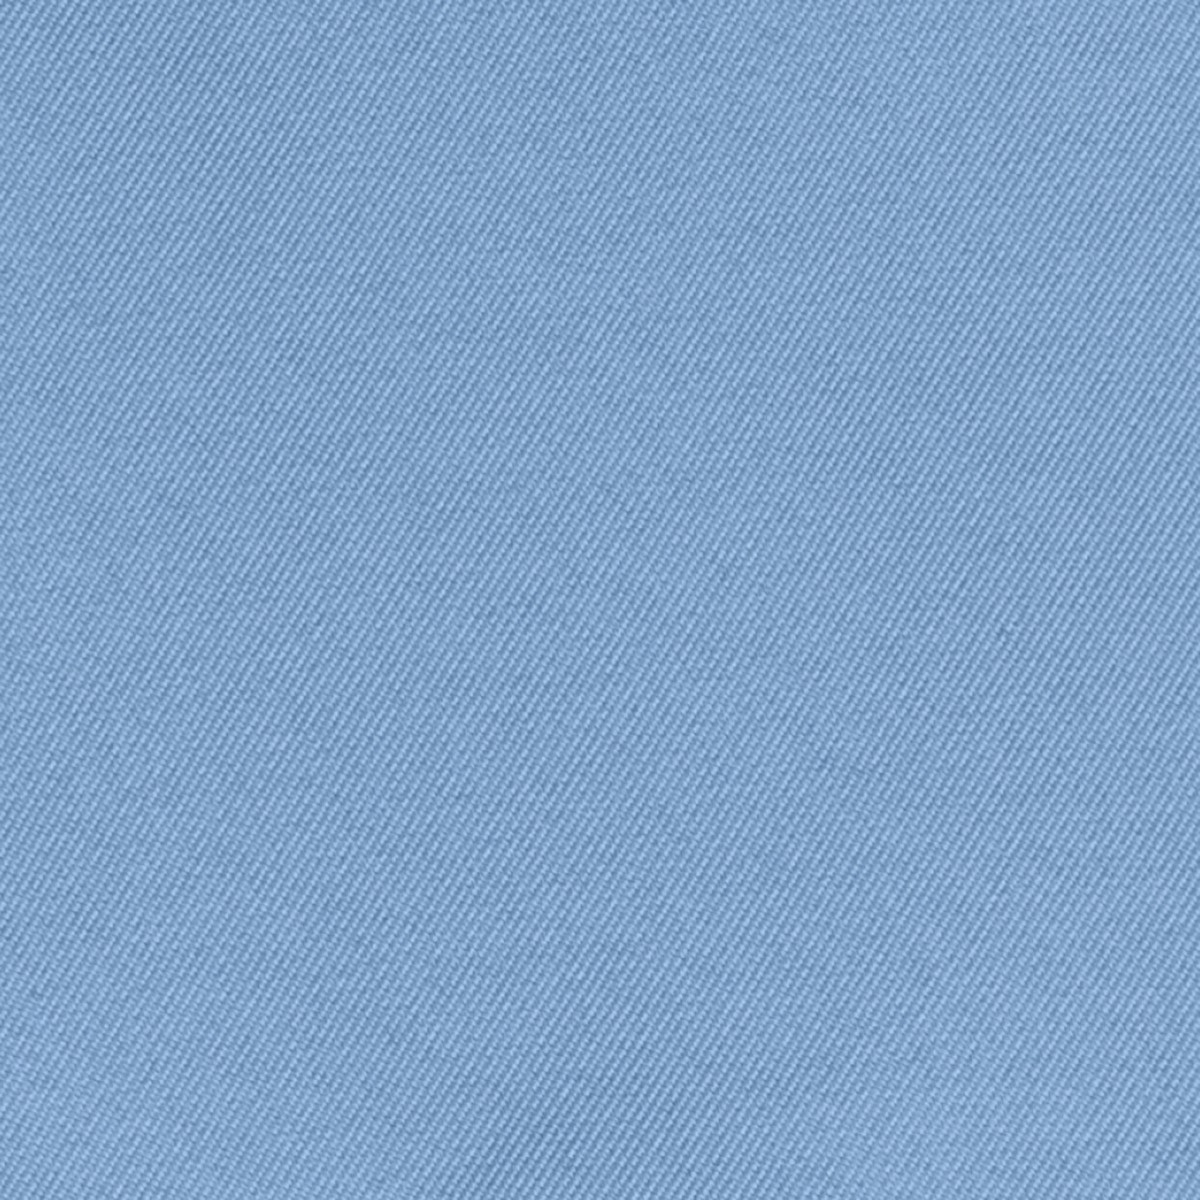 96232-SILLA PASEO JOOLZ AER SPLENDID BLUE(0-0)-4